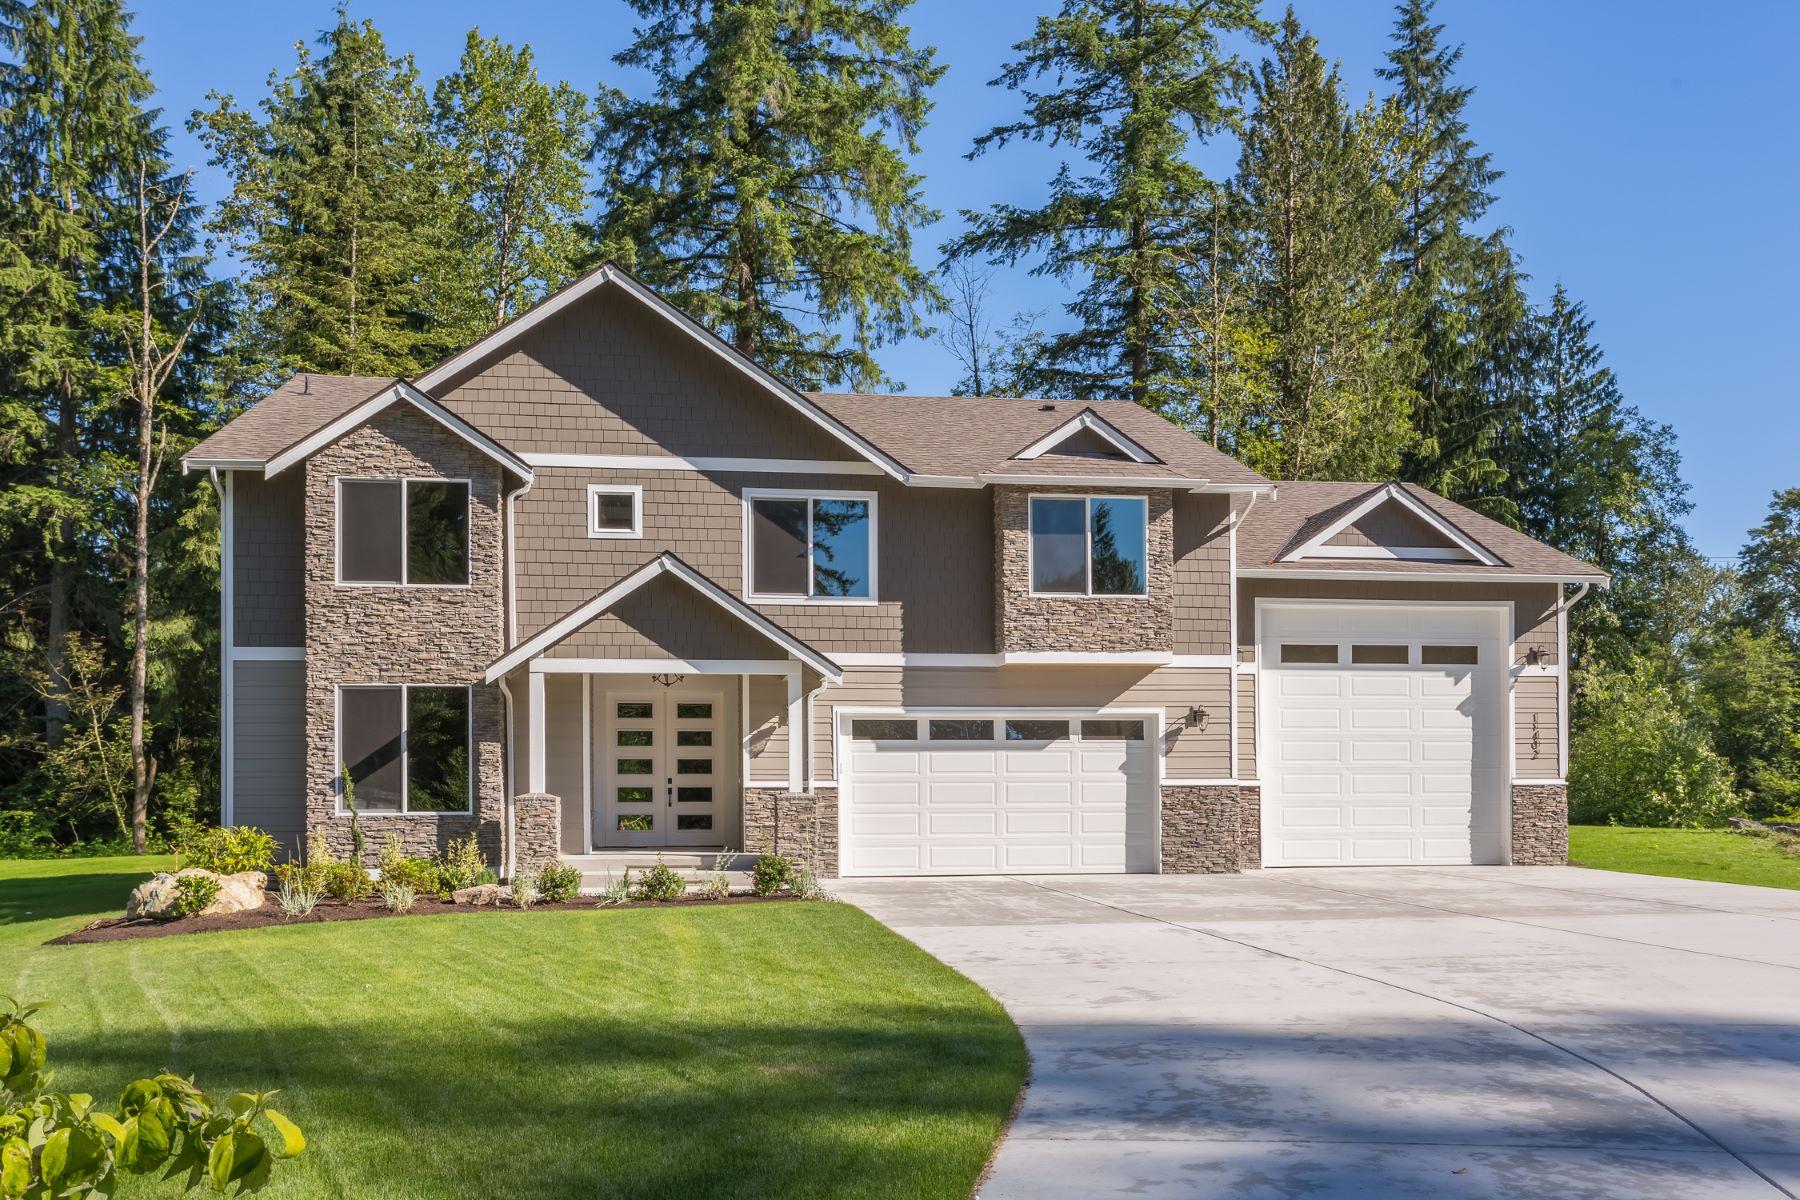 Villa per Vendita alle ore Exquisite Echo Lake Living 11402 207th St SE (Lot 8) Snohomish, Washington, 98296 Stati Uniti